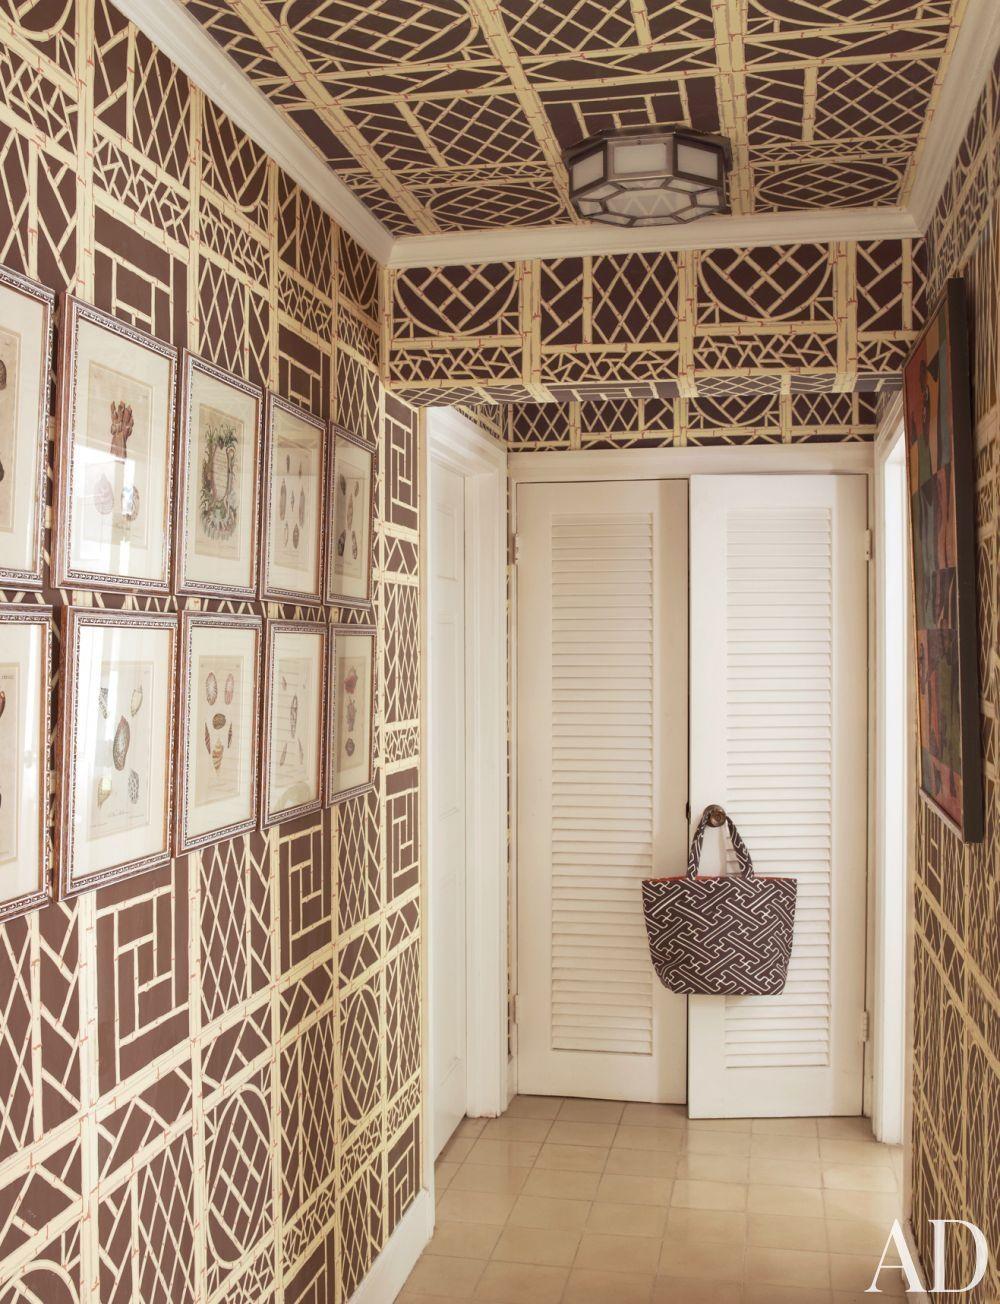 Beach Staircase Hallway By Andrew Raquet Interior Design